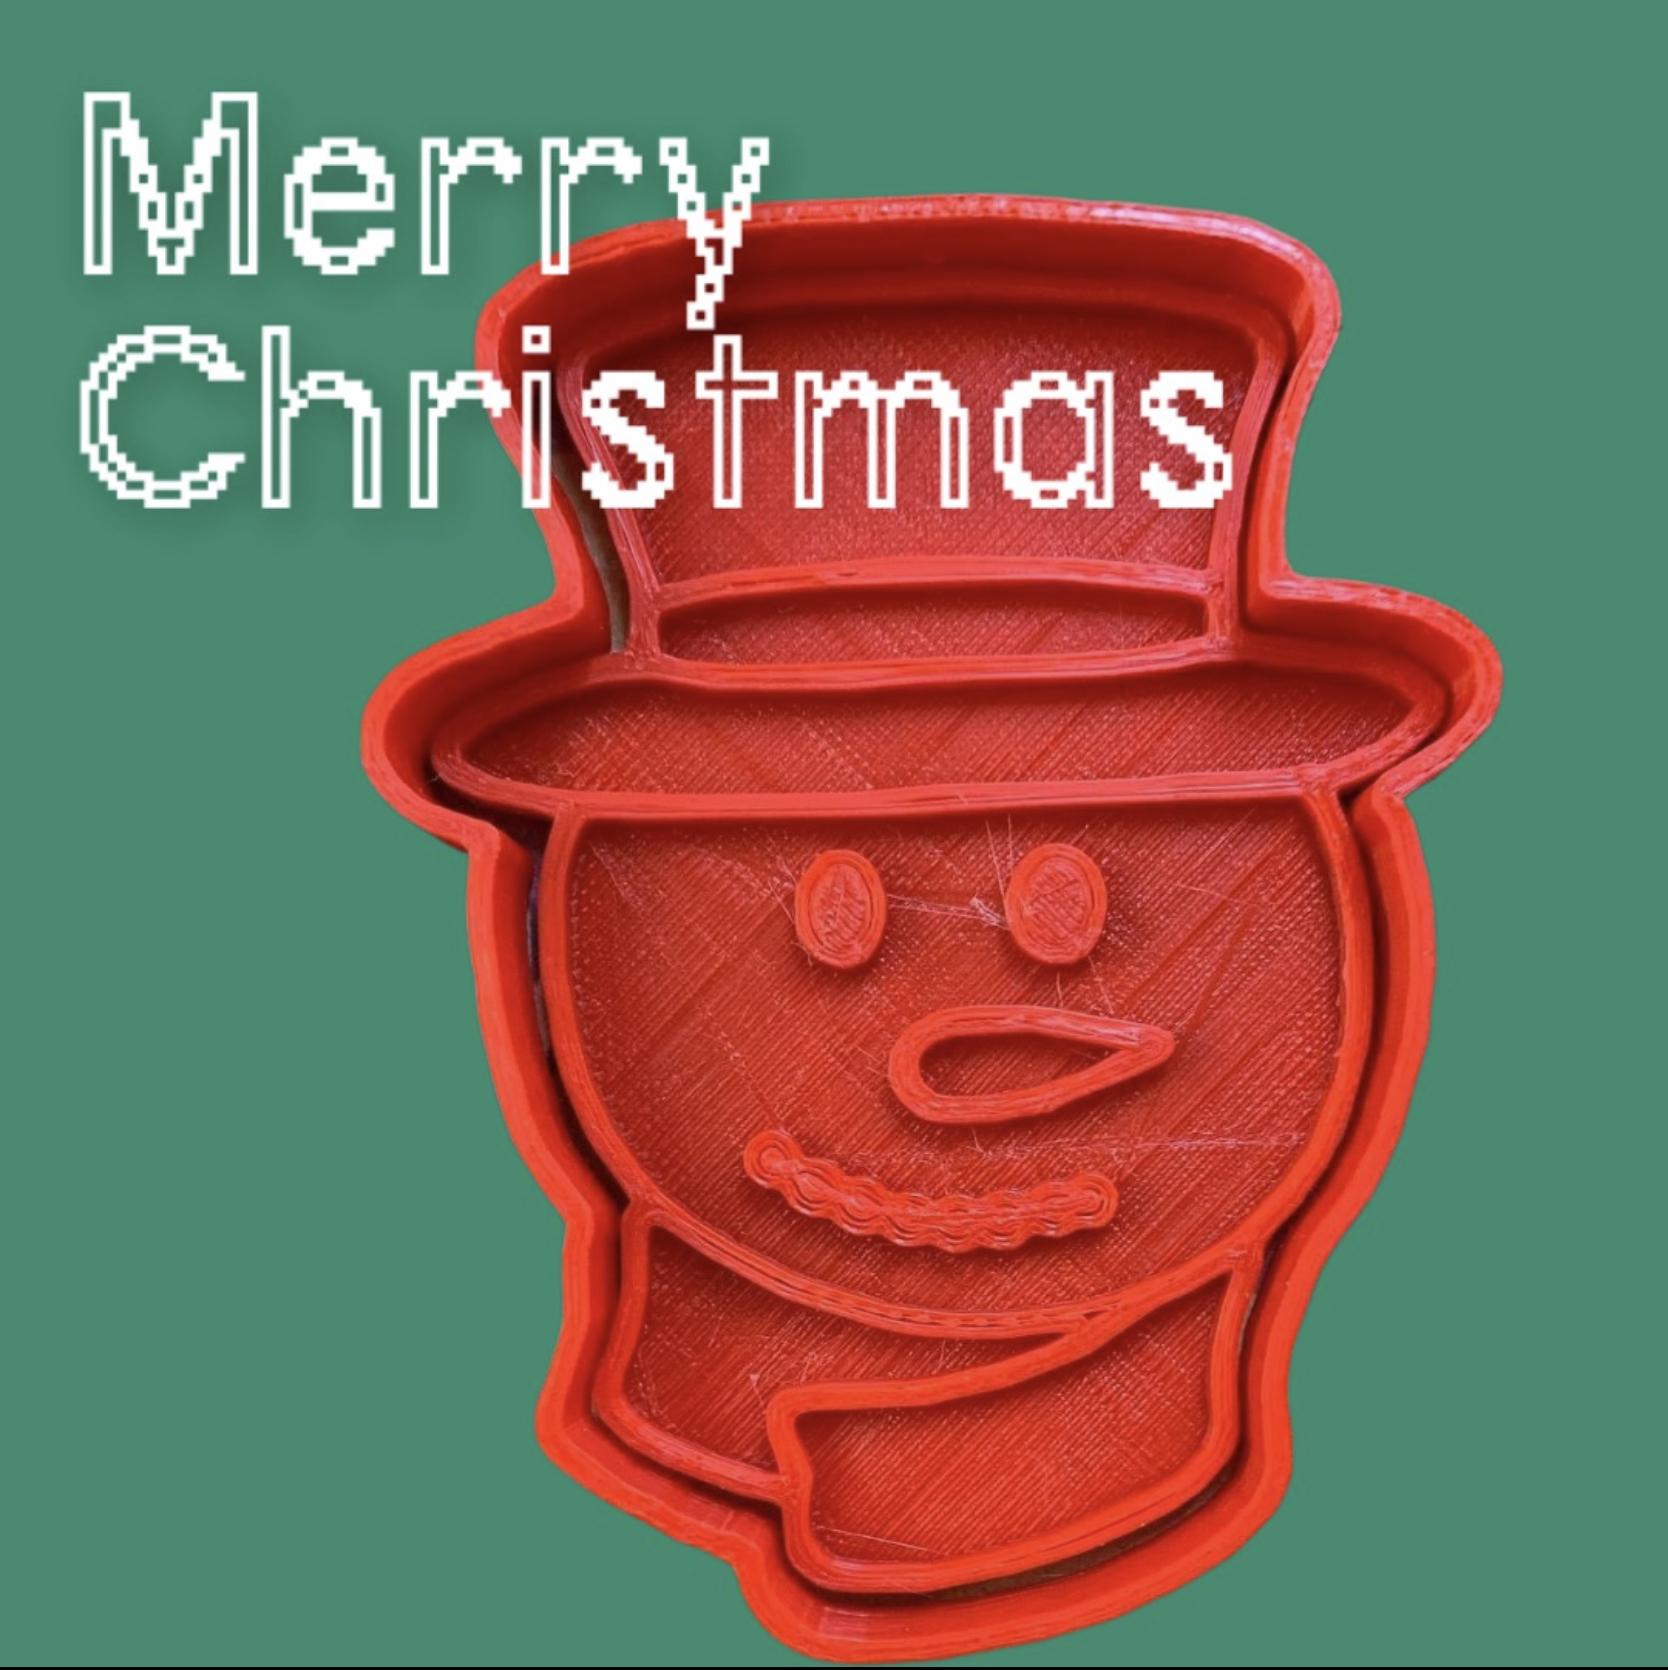 7021E154-37D6-4A0E-8866-90730D27698E.jpeg Download STL file Cookie Cutter Christmas Snowman • 3D print template, carloseduardoalfonsogarcia